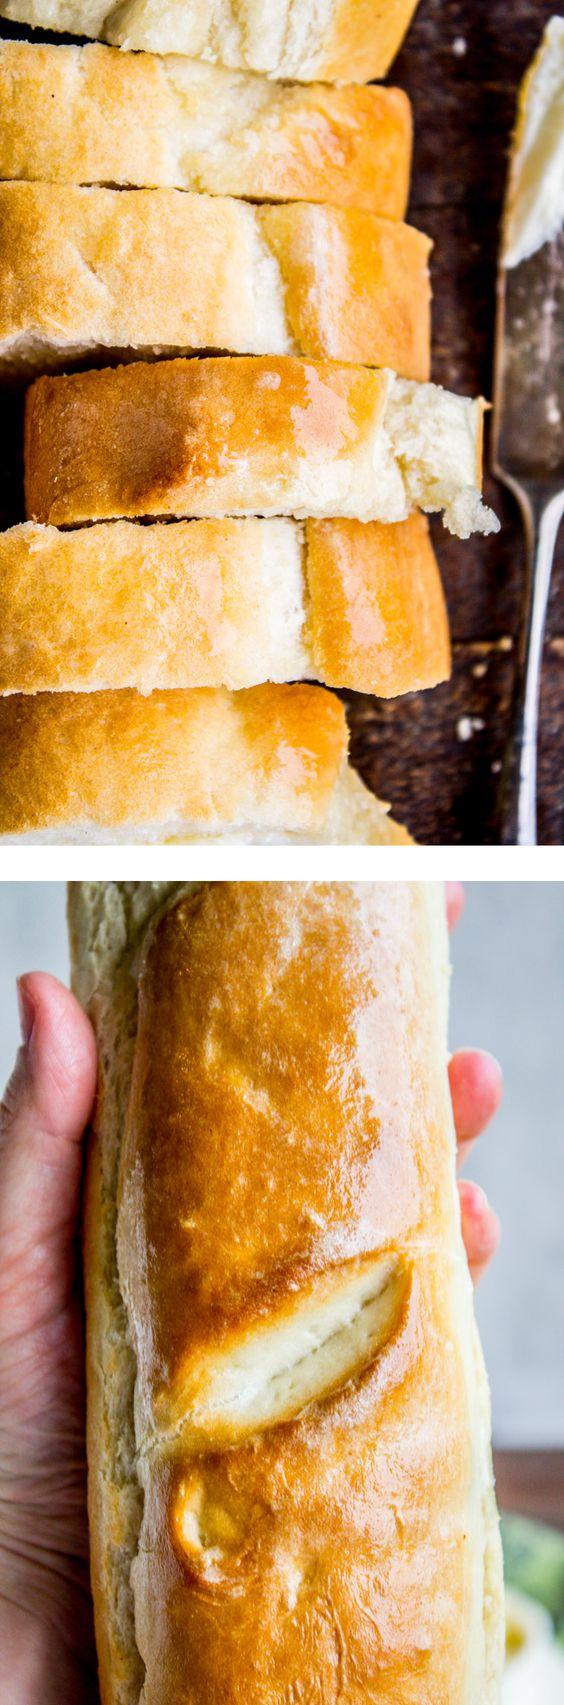 French Toast Recipe Baked Ovens